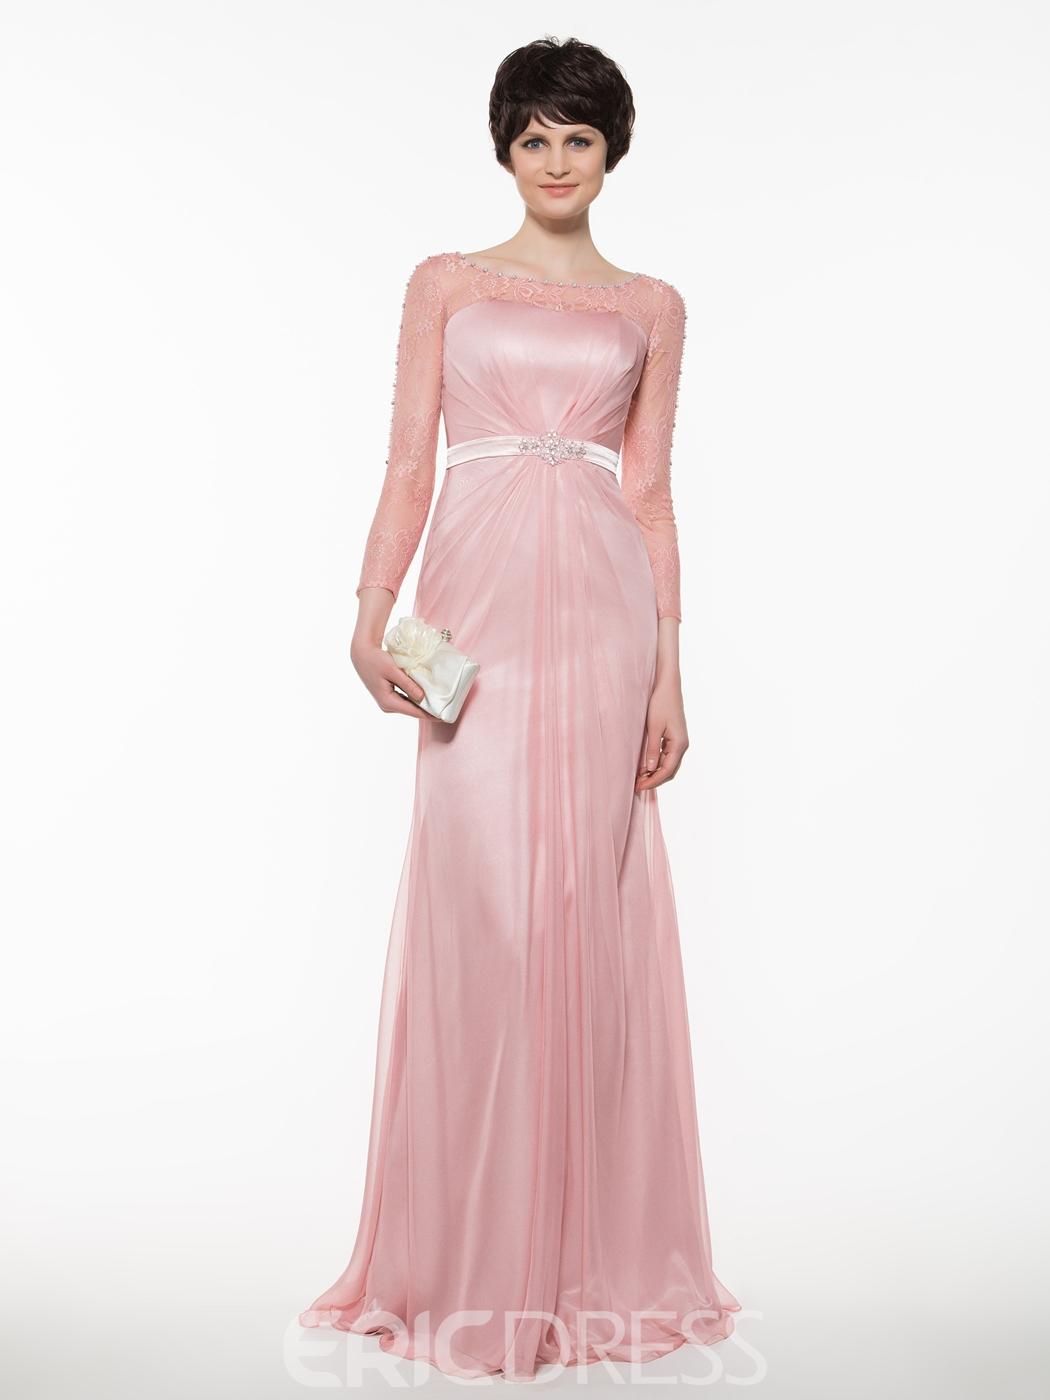 Elegant Bateau A Line Long Mother Of The Bride Dress - Cute Dresses